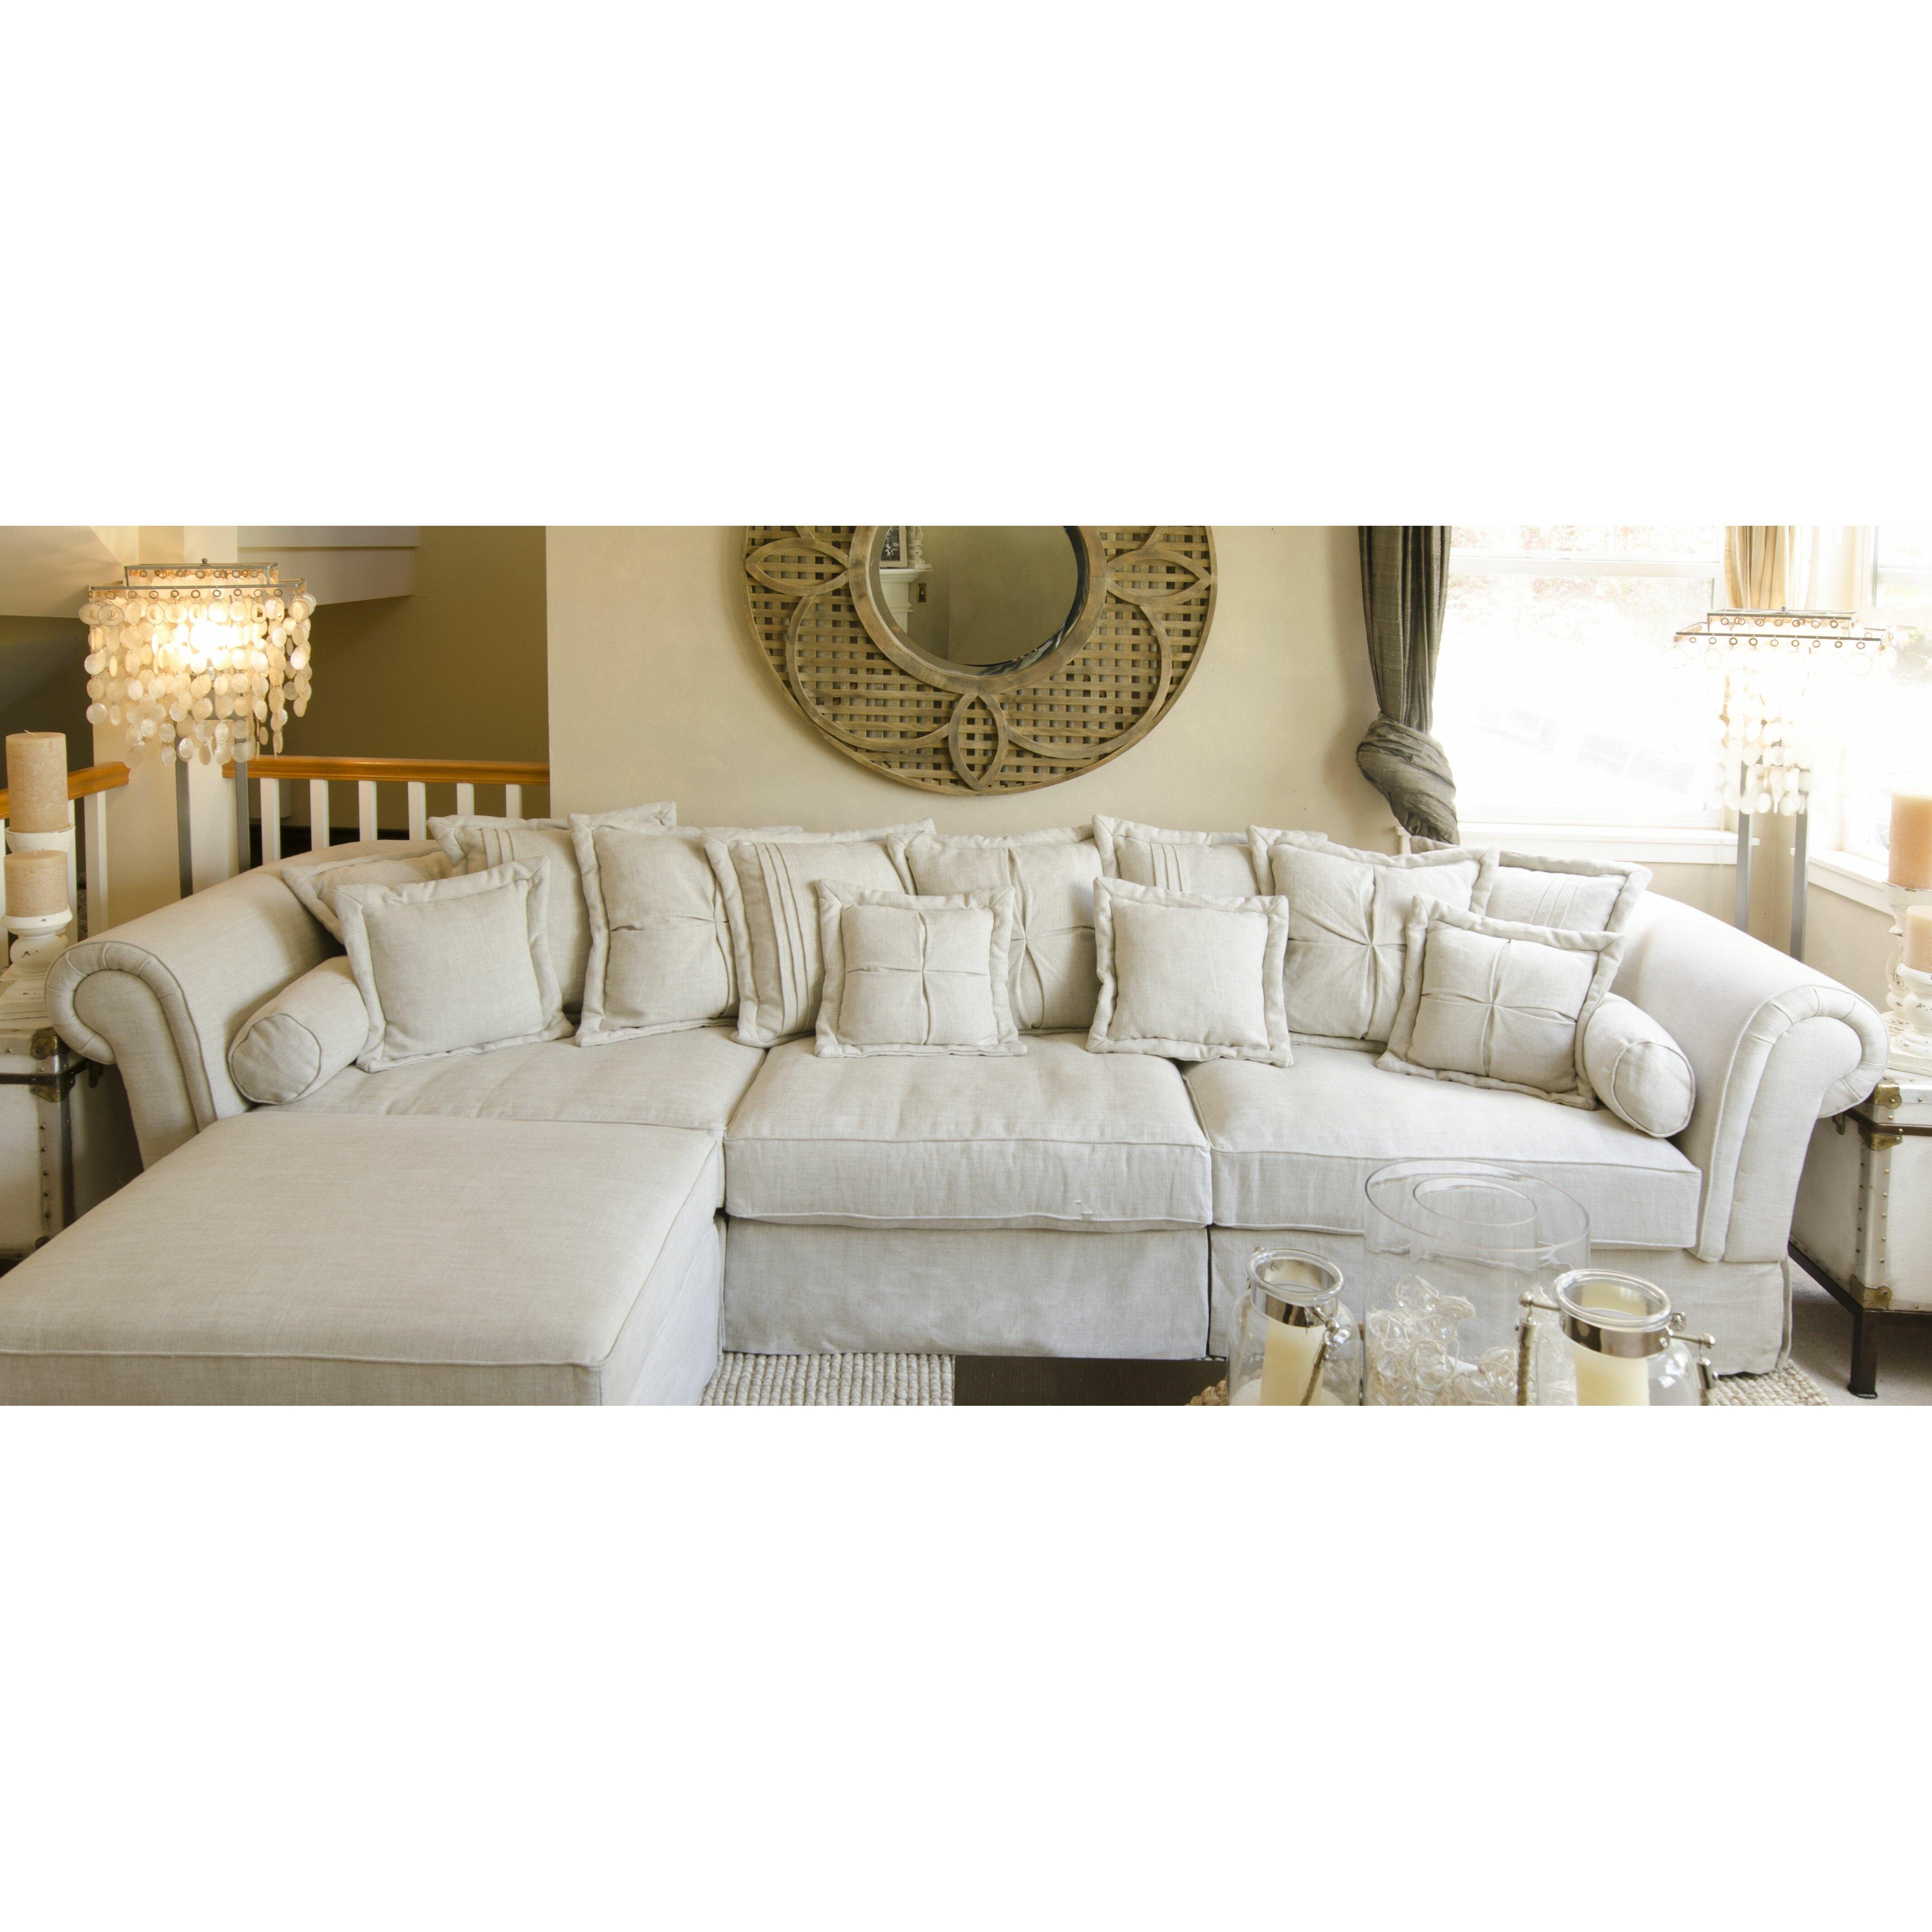 Elements fine home furnishings bella modular sofa for Find home furnishings